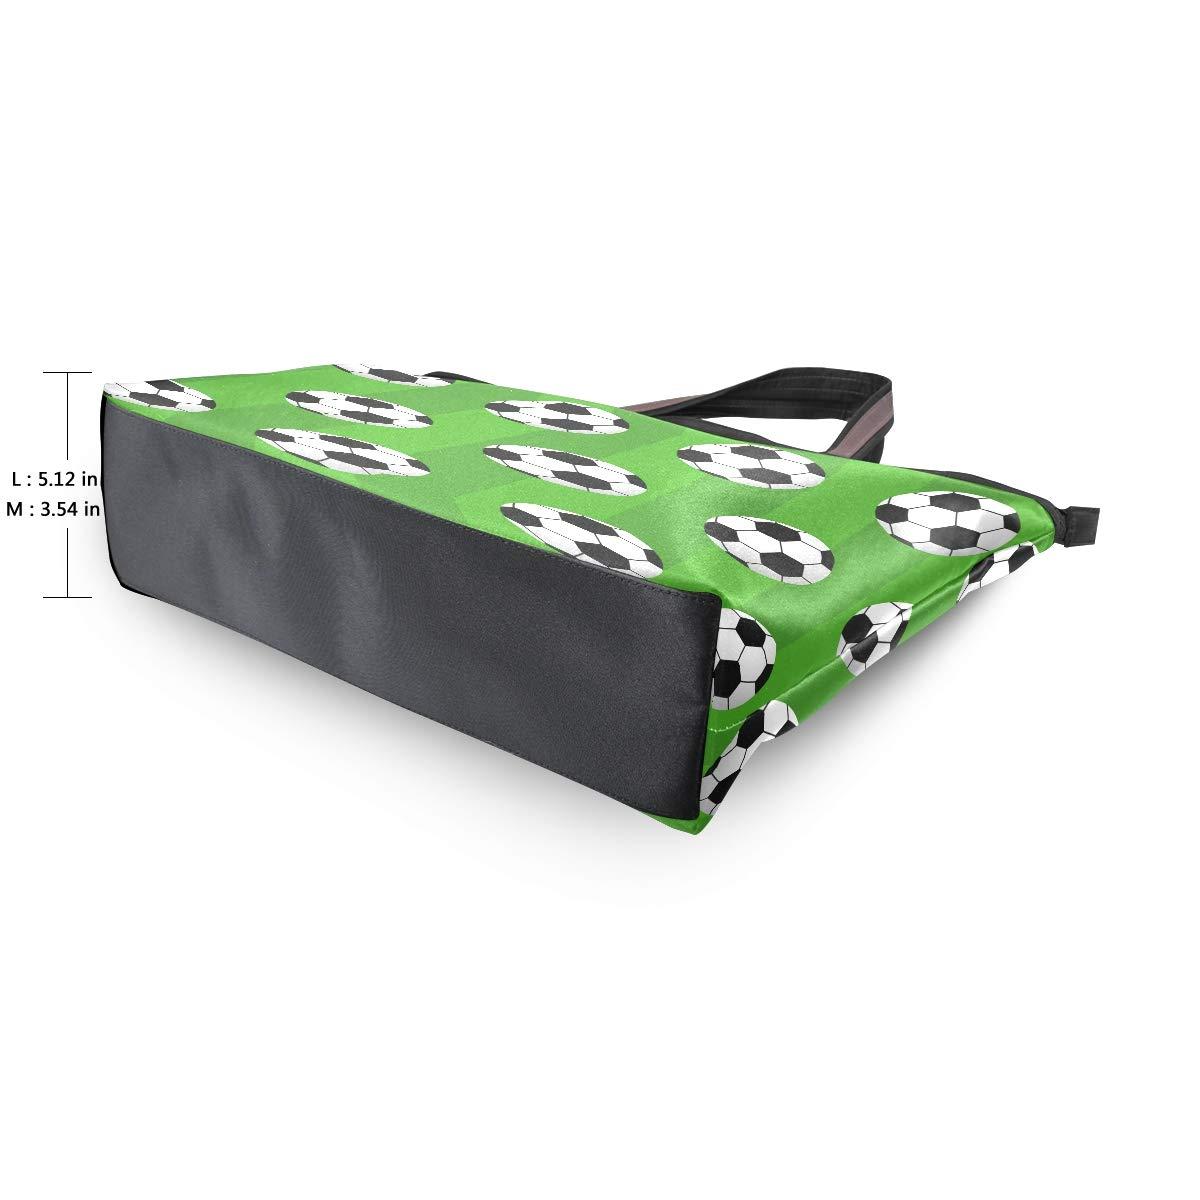 HousingMart Large Women Tote Bag Soccer Ball Field Handbags Tote Handle with Zipper Shoulder Bag Grocery Shopping Work Bag